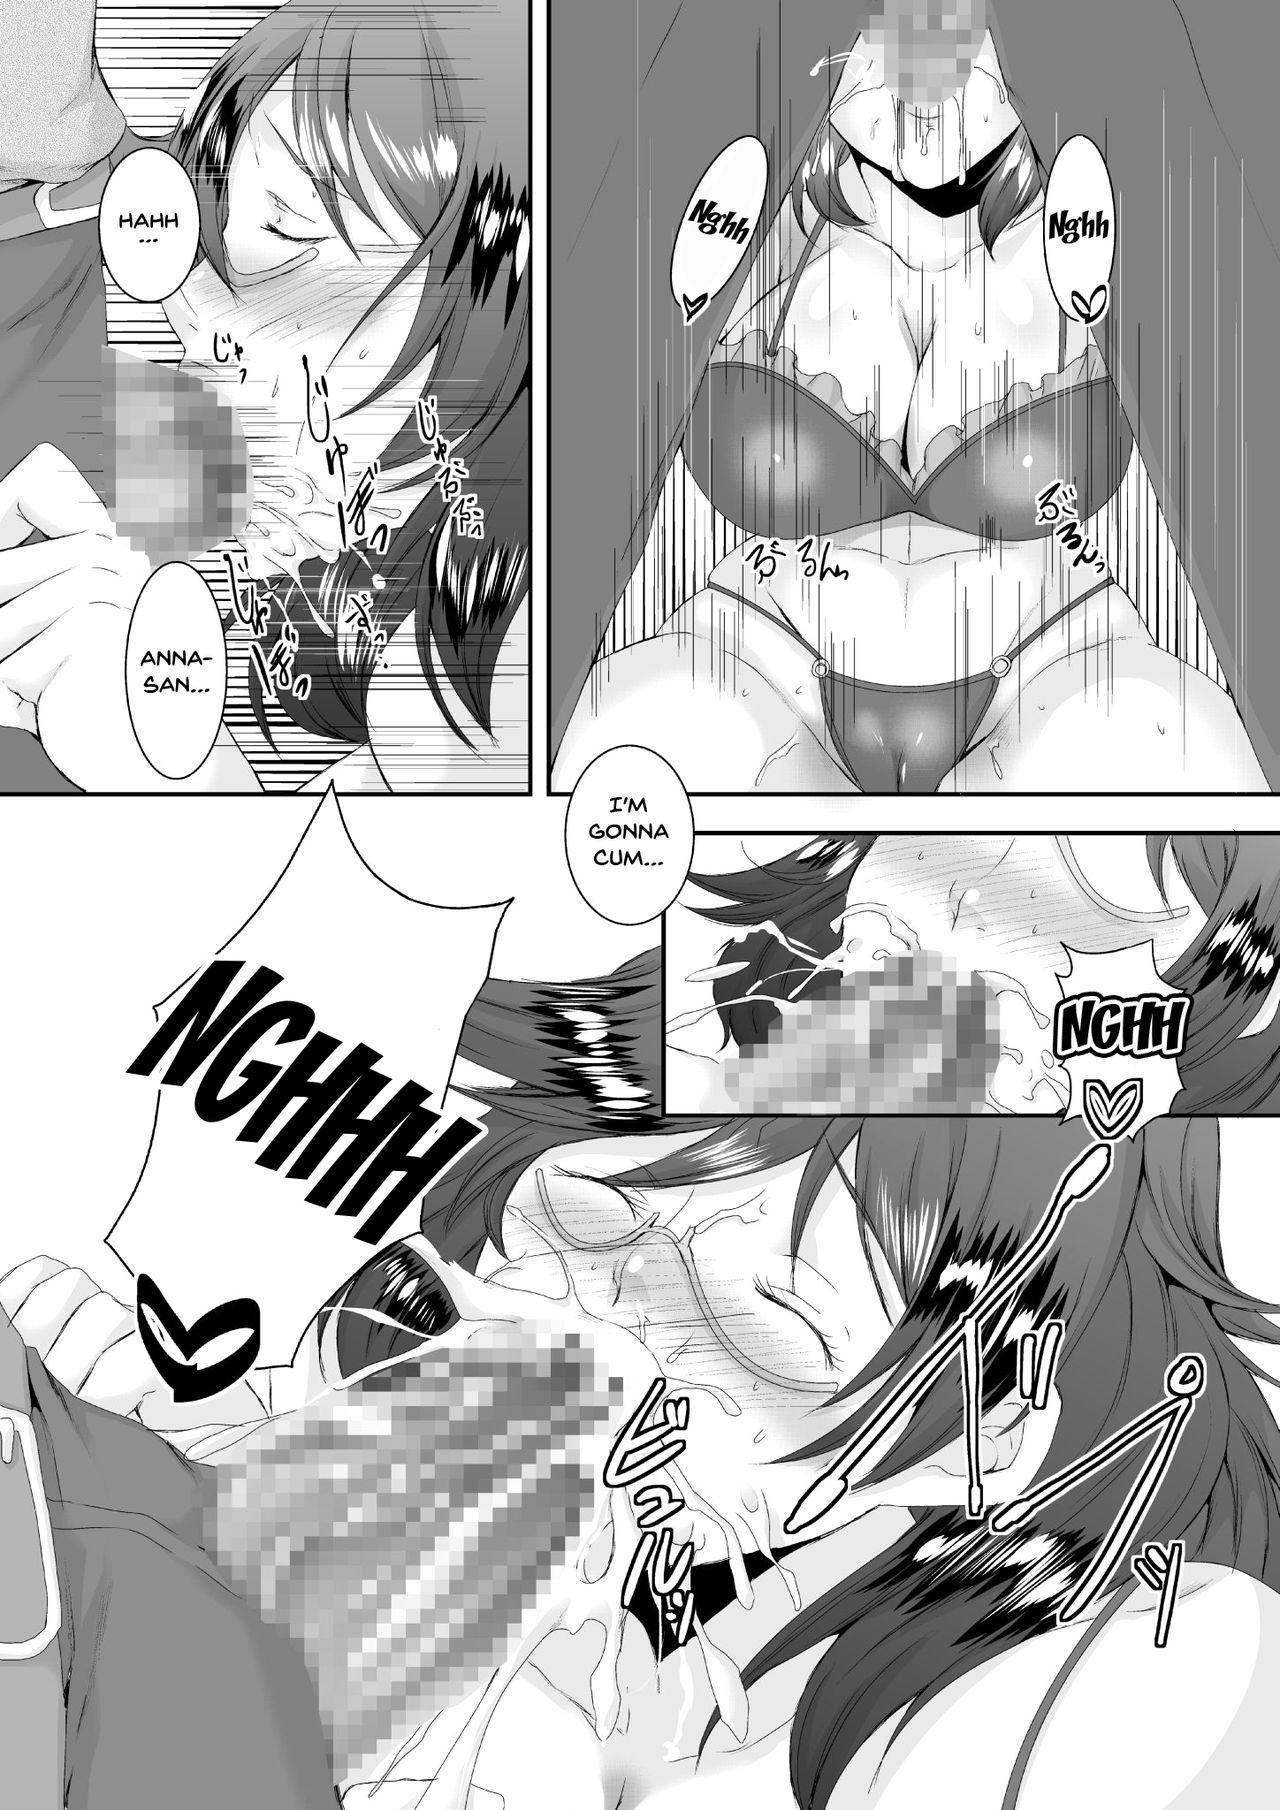 [Sprechchor (Eguchi Chibi)] Oku-sama wa Moto Yariman -Besluted- 2   These Women Were Former Sluts -Besluted- 2 [English] [Doujins.com] [Digital] 16